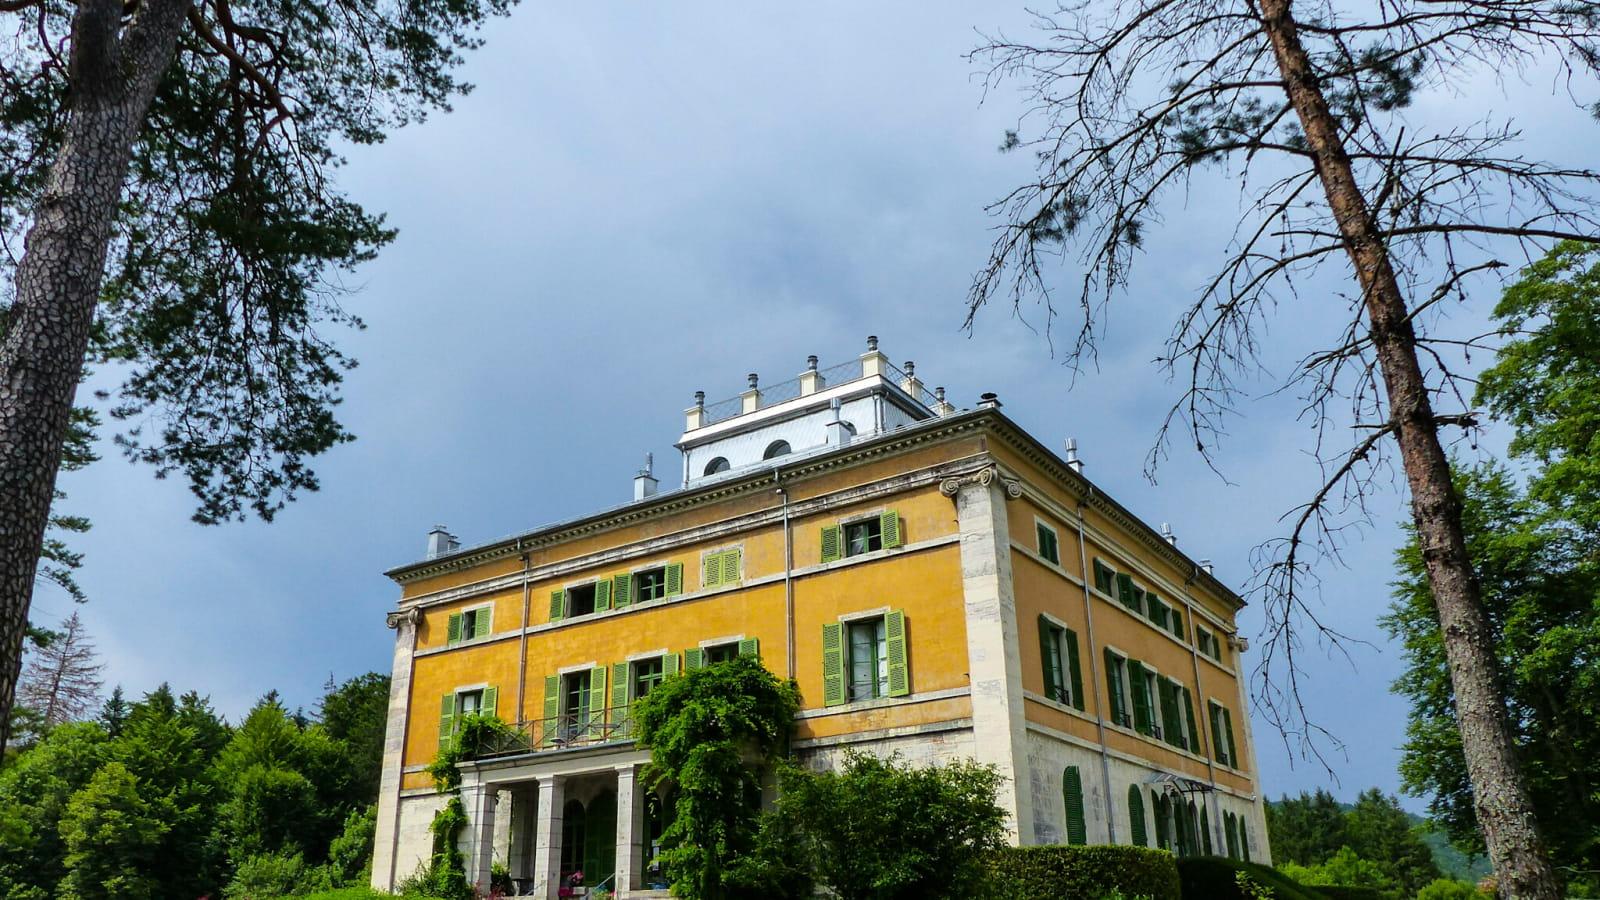 Chateau de Syam - Villa palladienne